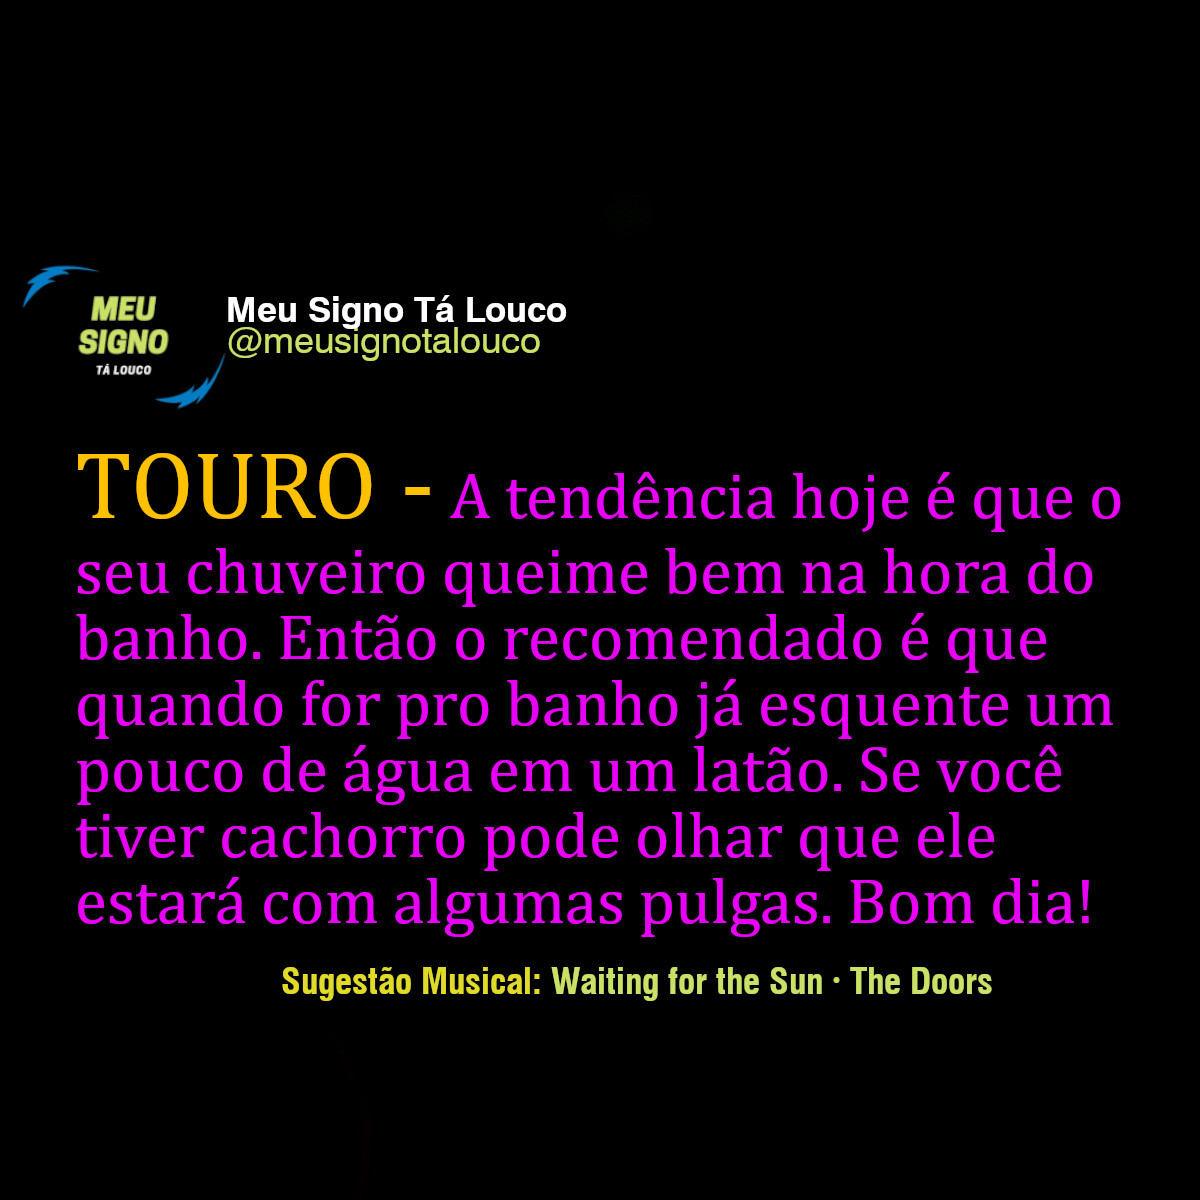 #Áries #Peixes #Aquário #Touro #Signos #Bomdia https://t.co/H5q7kyGC6b